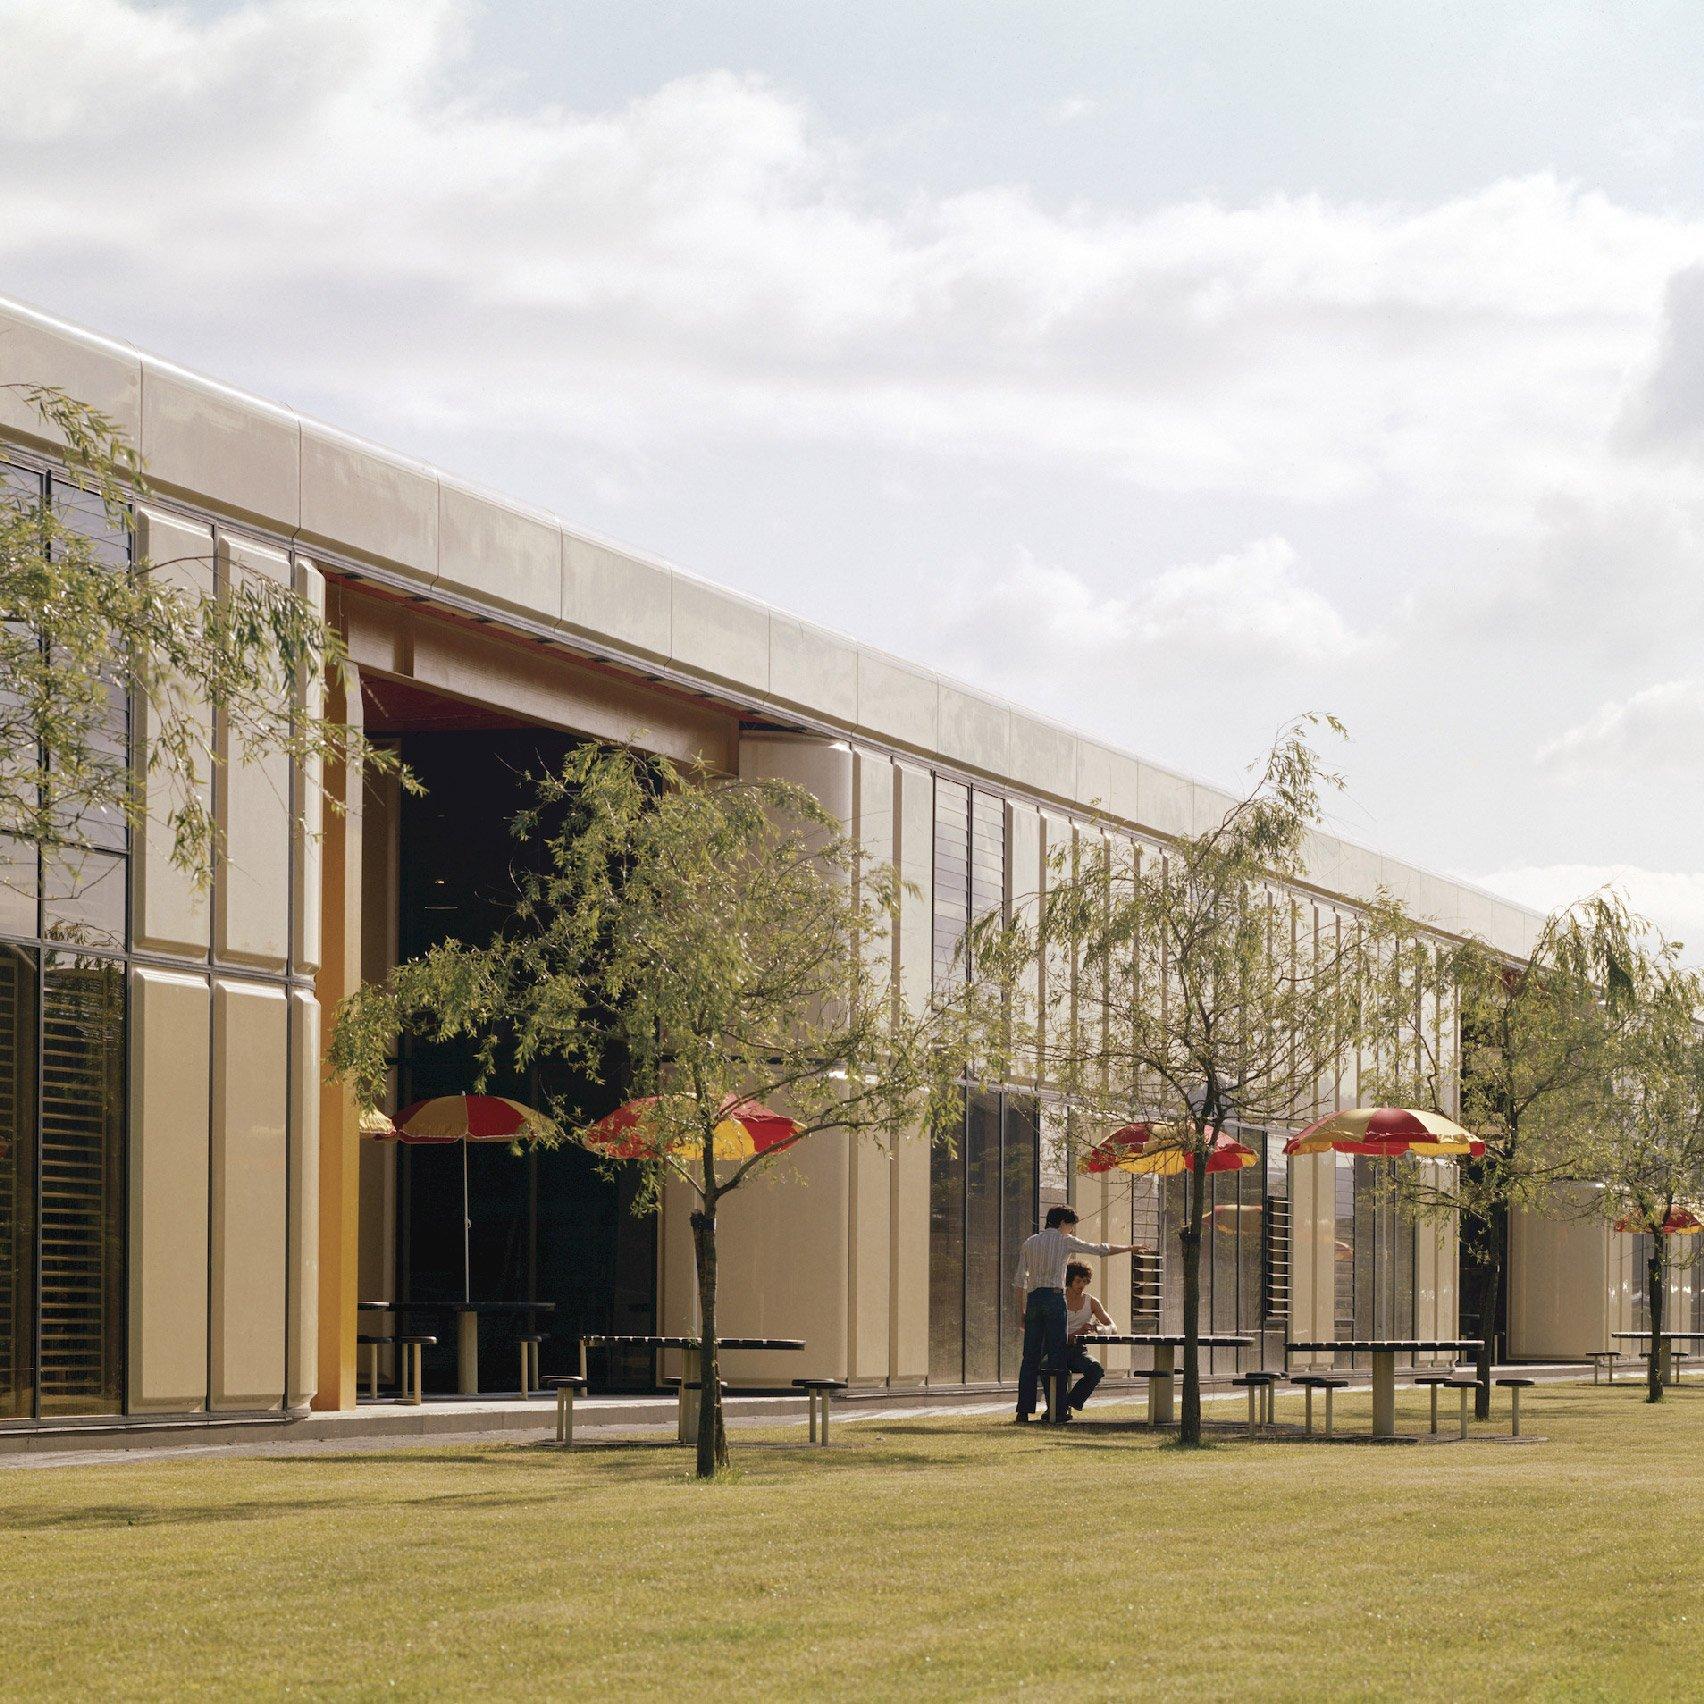 High-tech buildings: Herman Miller Factory in Bath by Grimshaw Farrell Partnership